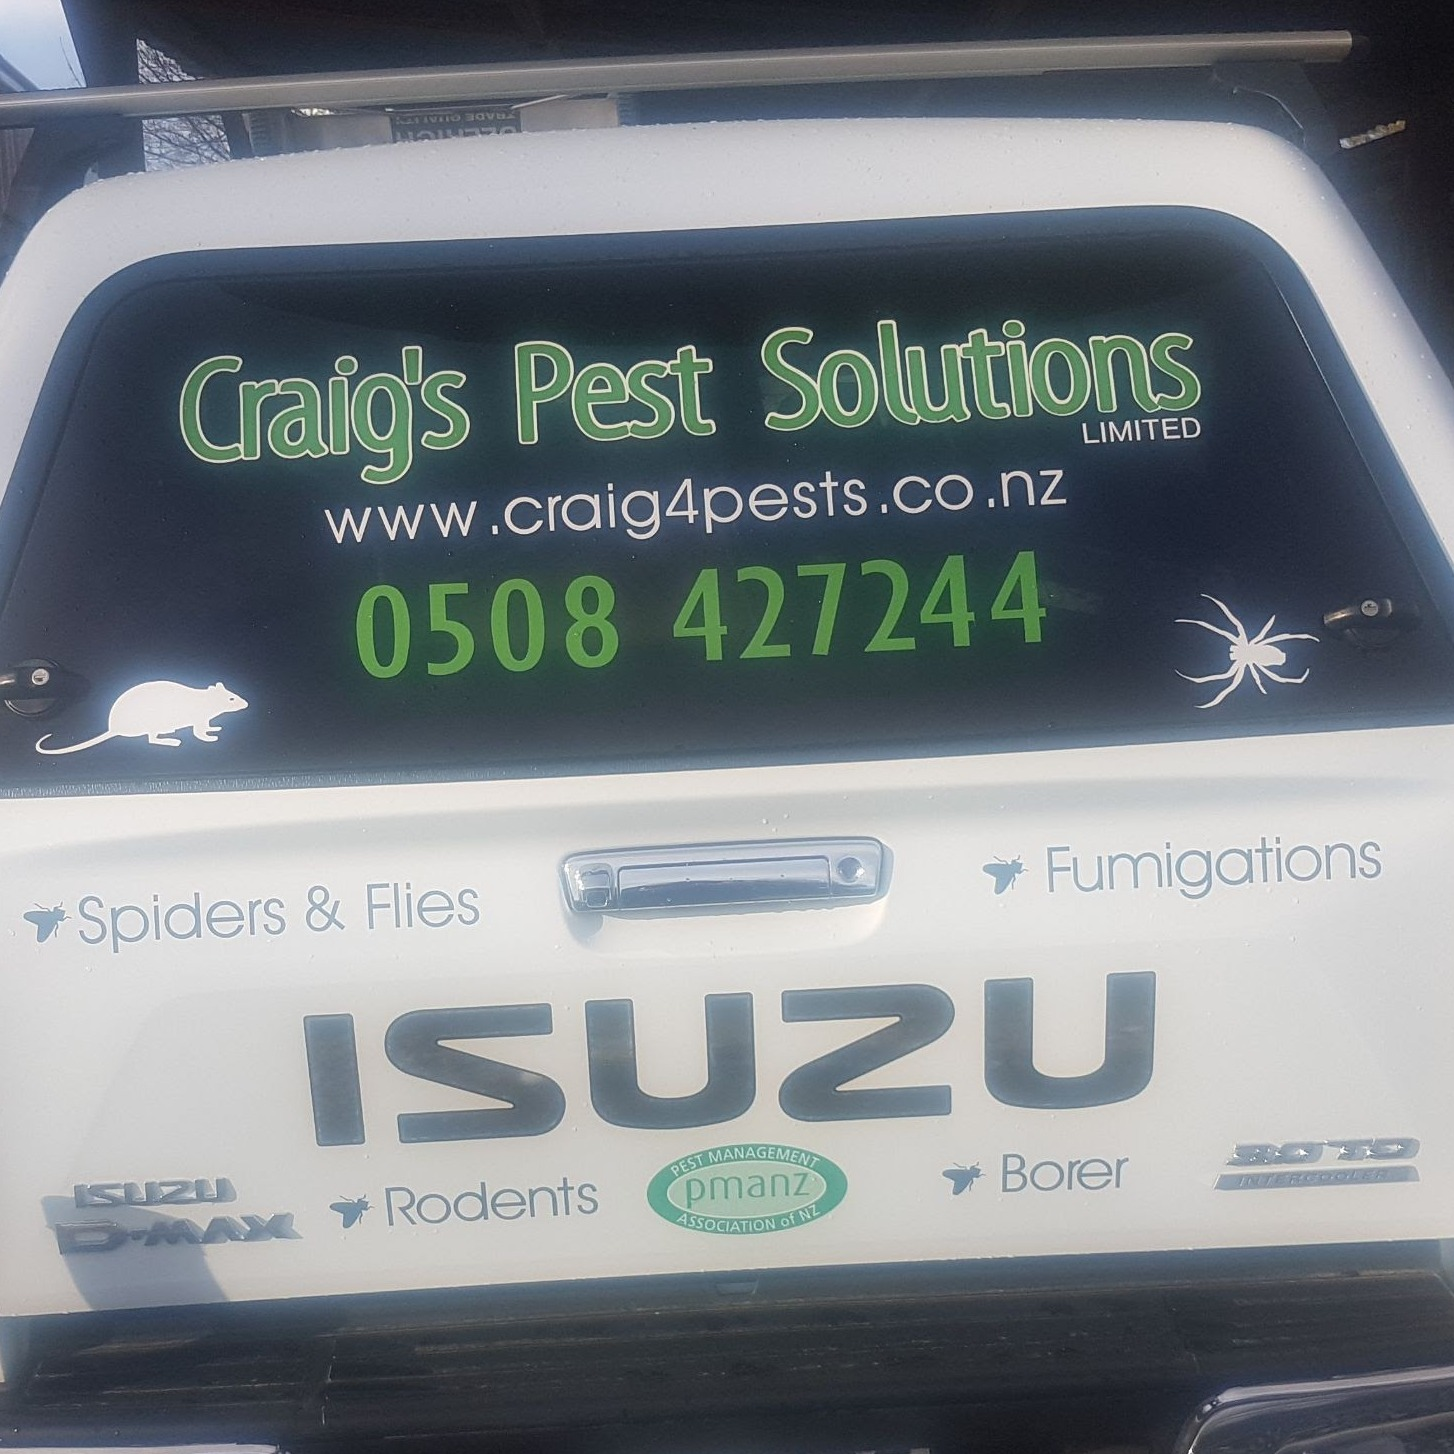 Craig's Pest Solutions Ltd